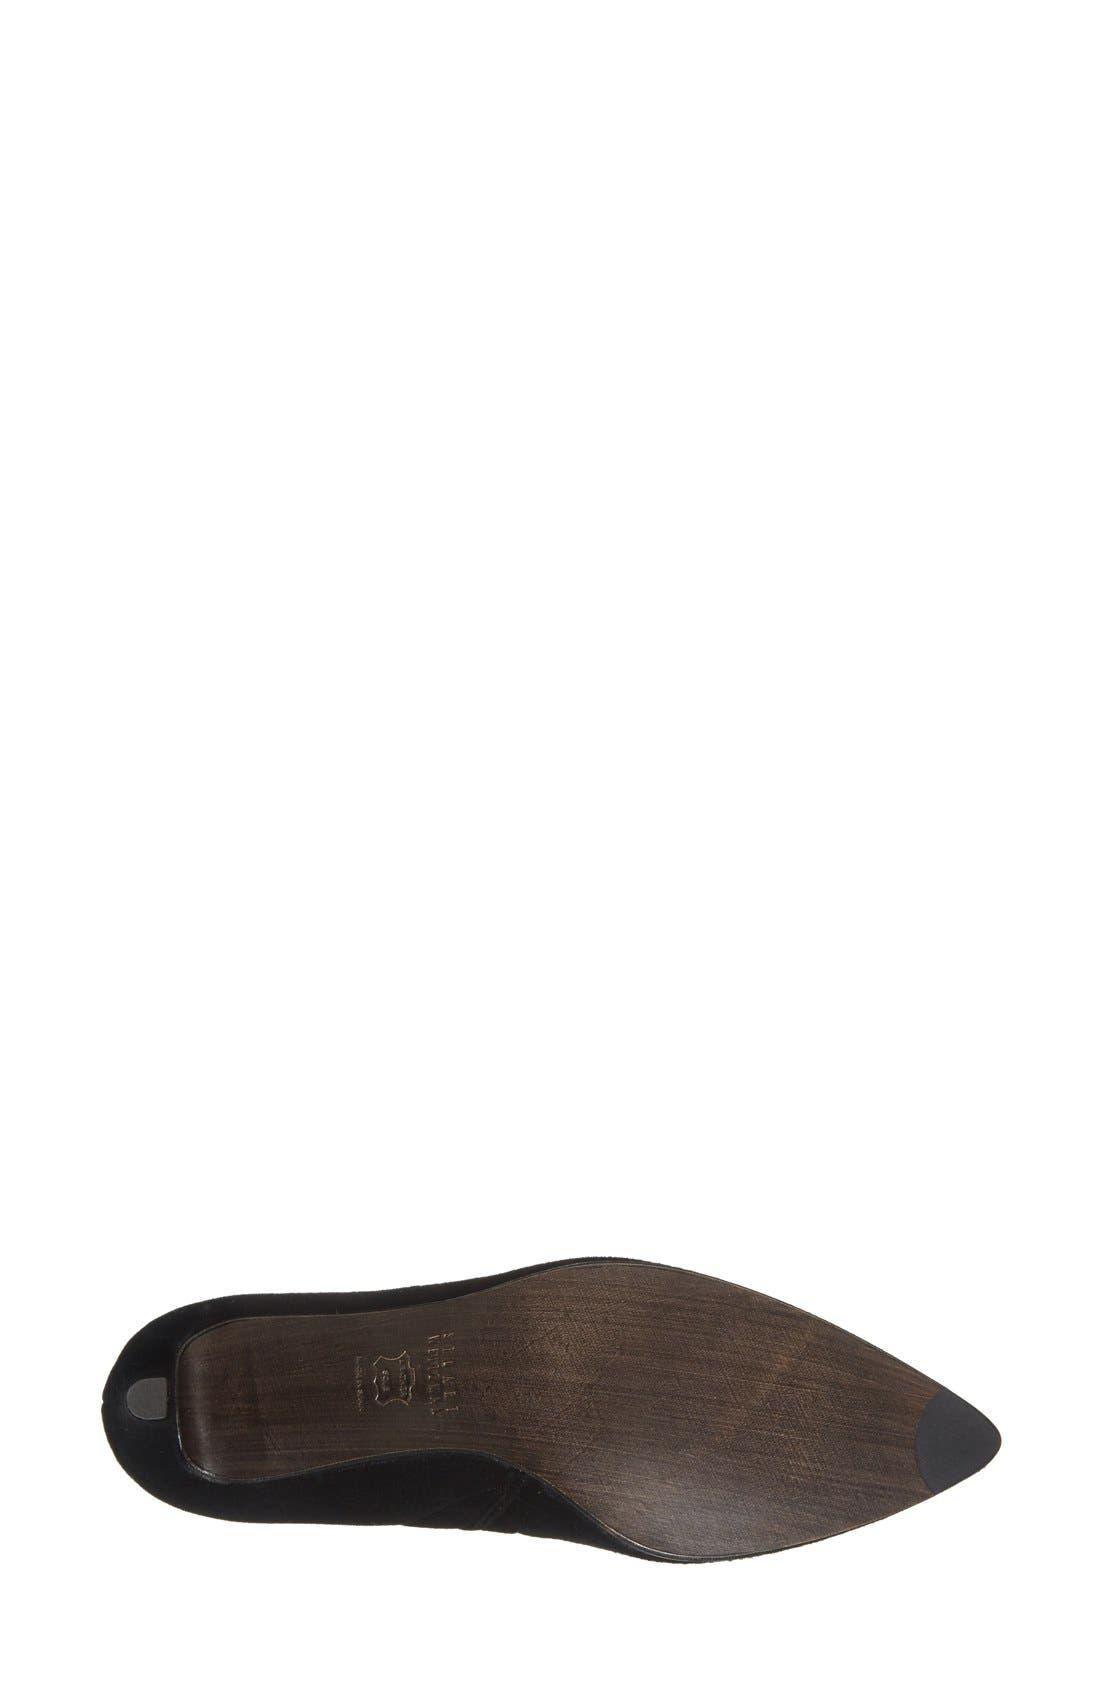 Alternate Image 4  - Stuart Weitzman 'Standin' Leather Ankle Bootie (Women)